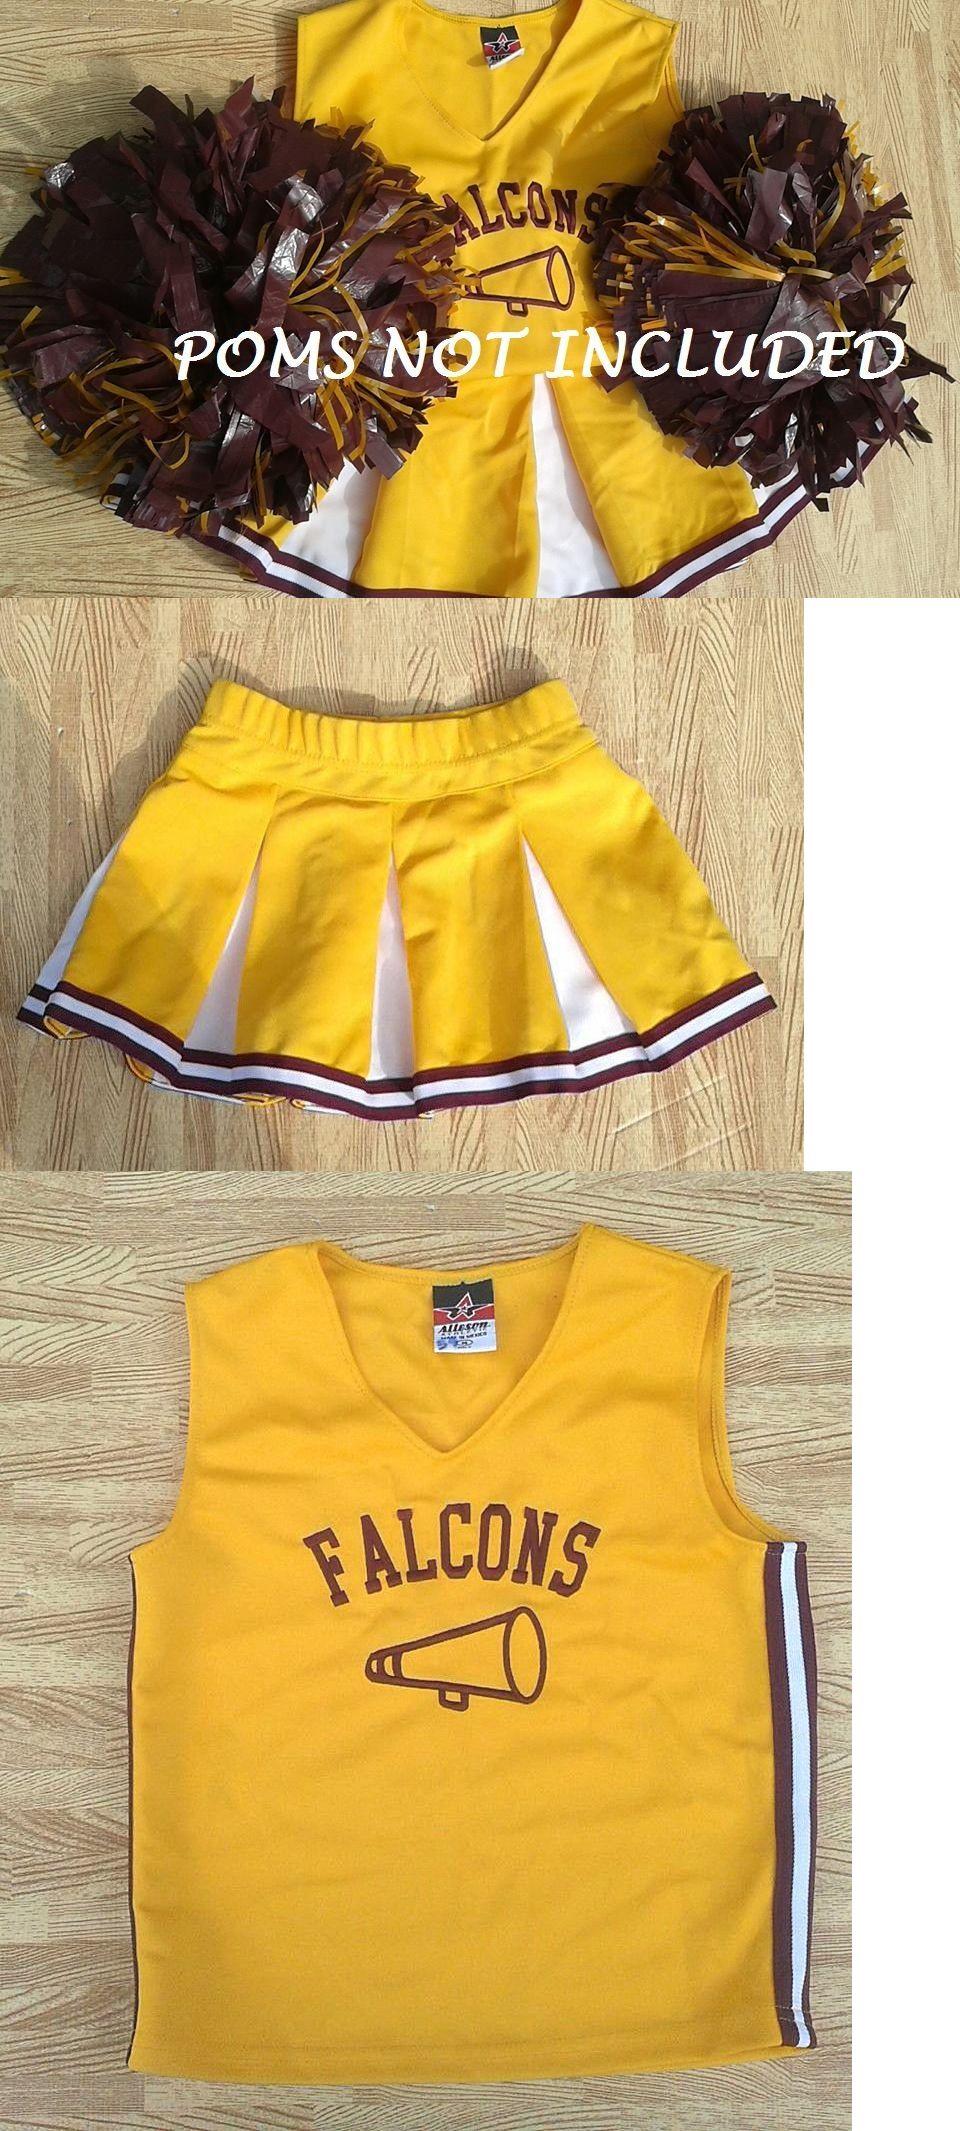 bd12177f8a3 Cheerleading 66832  Cute Girl L Real Gold Cheerleader Cheerleading Uniform  Top Skirt 24-28